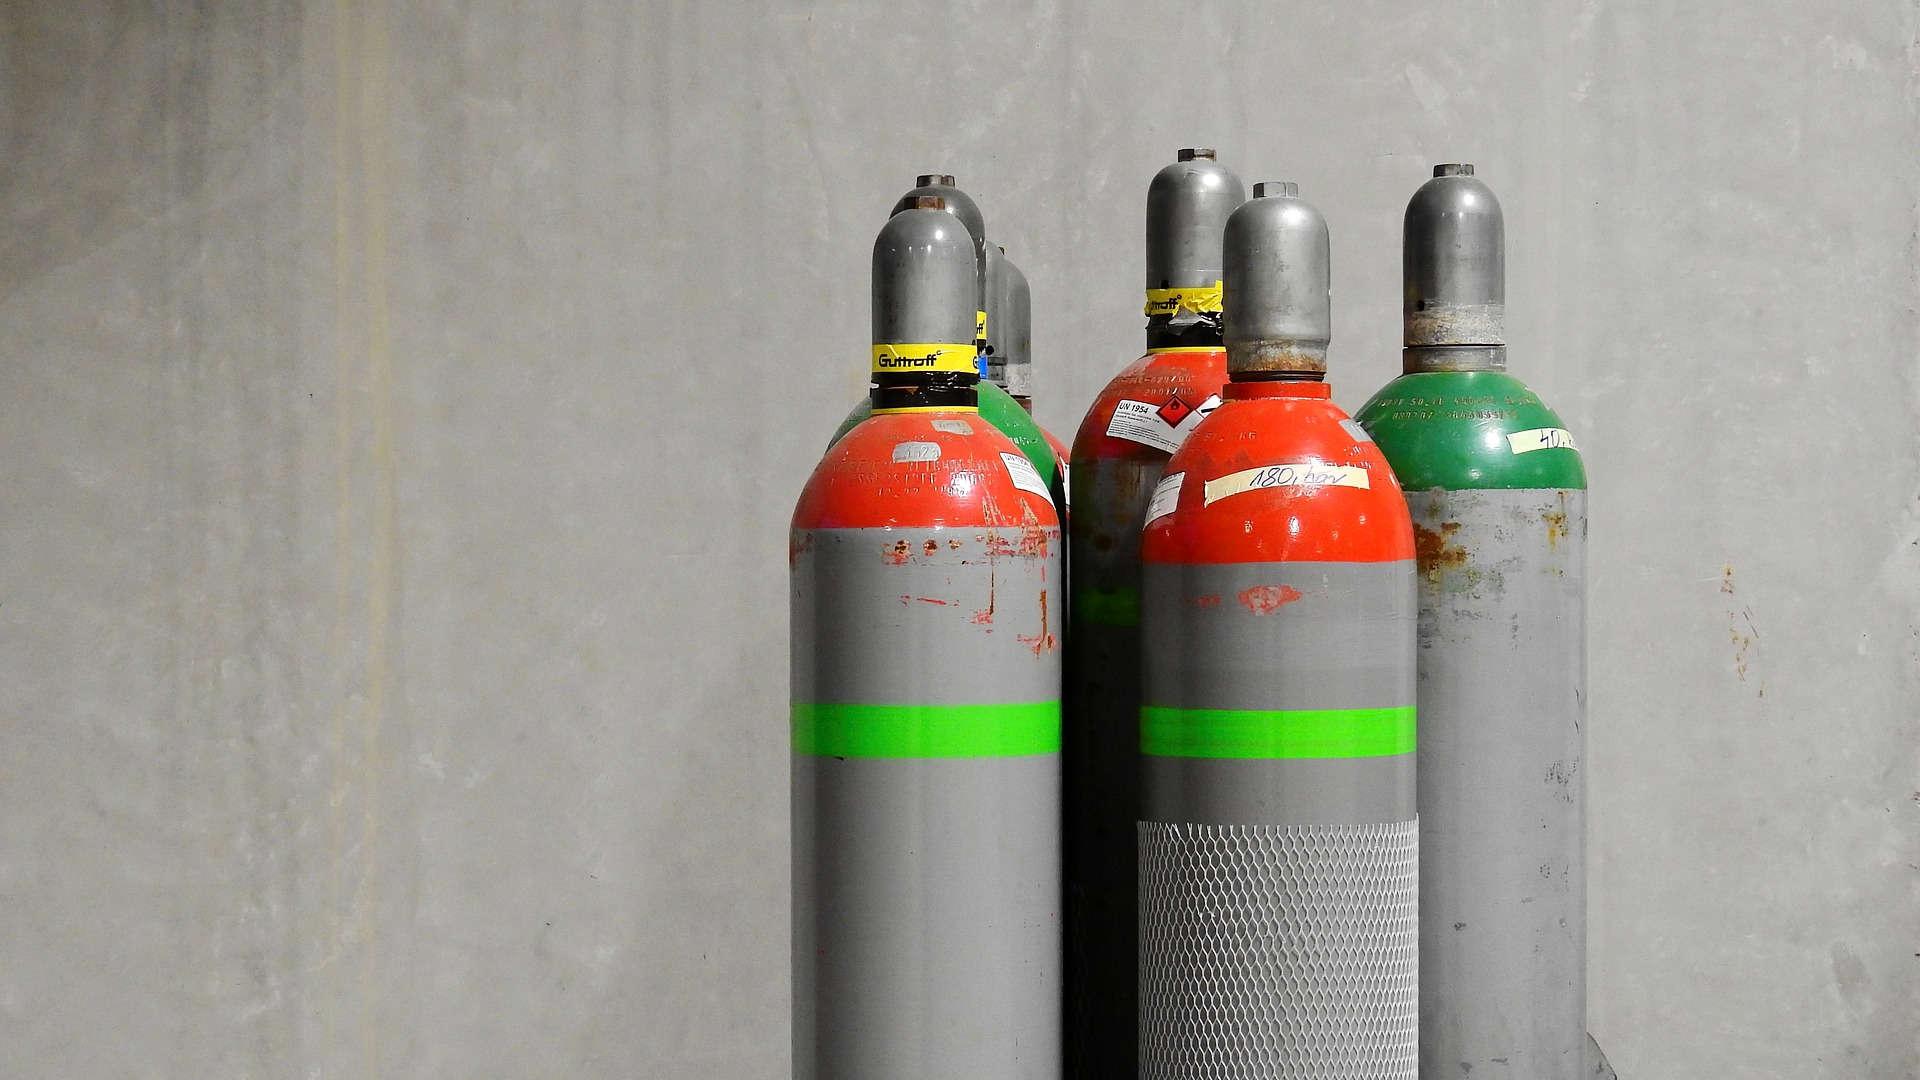 Efficient gas storage thanks to Metal-Organic Frameworks (MOFs)